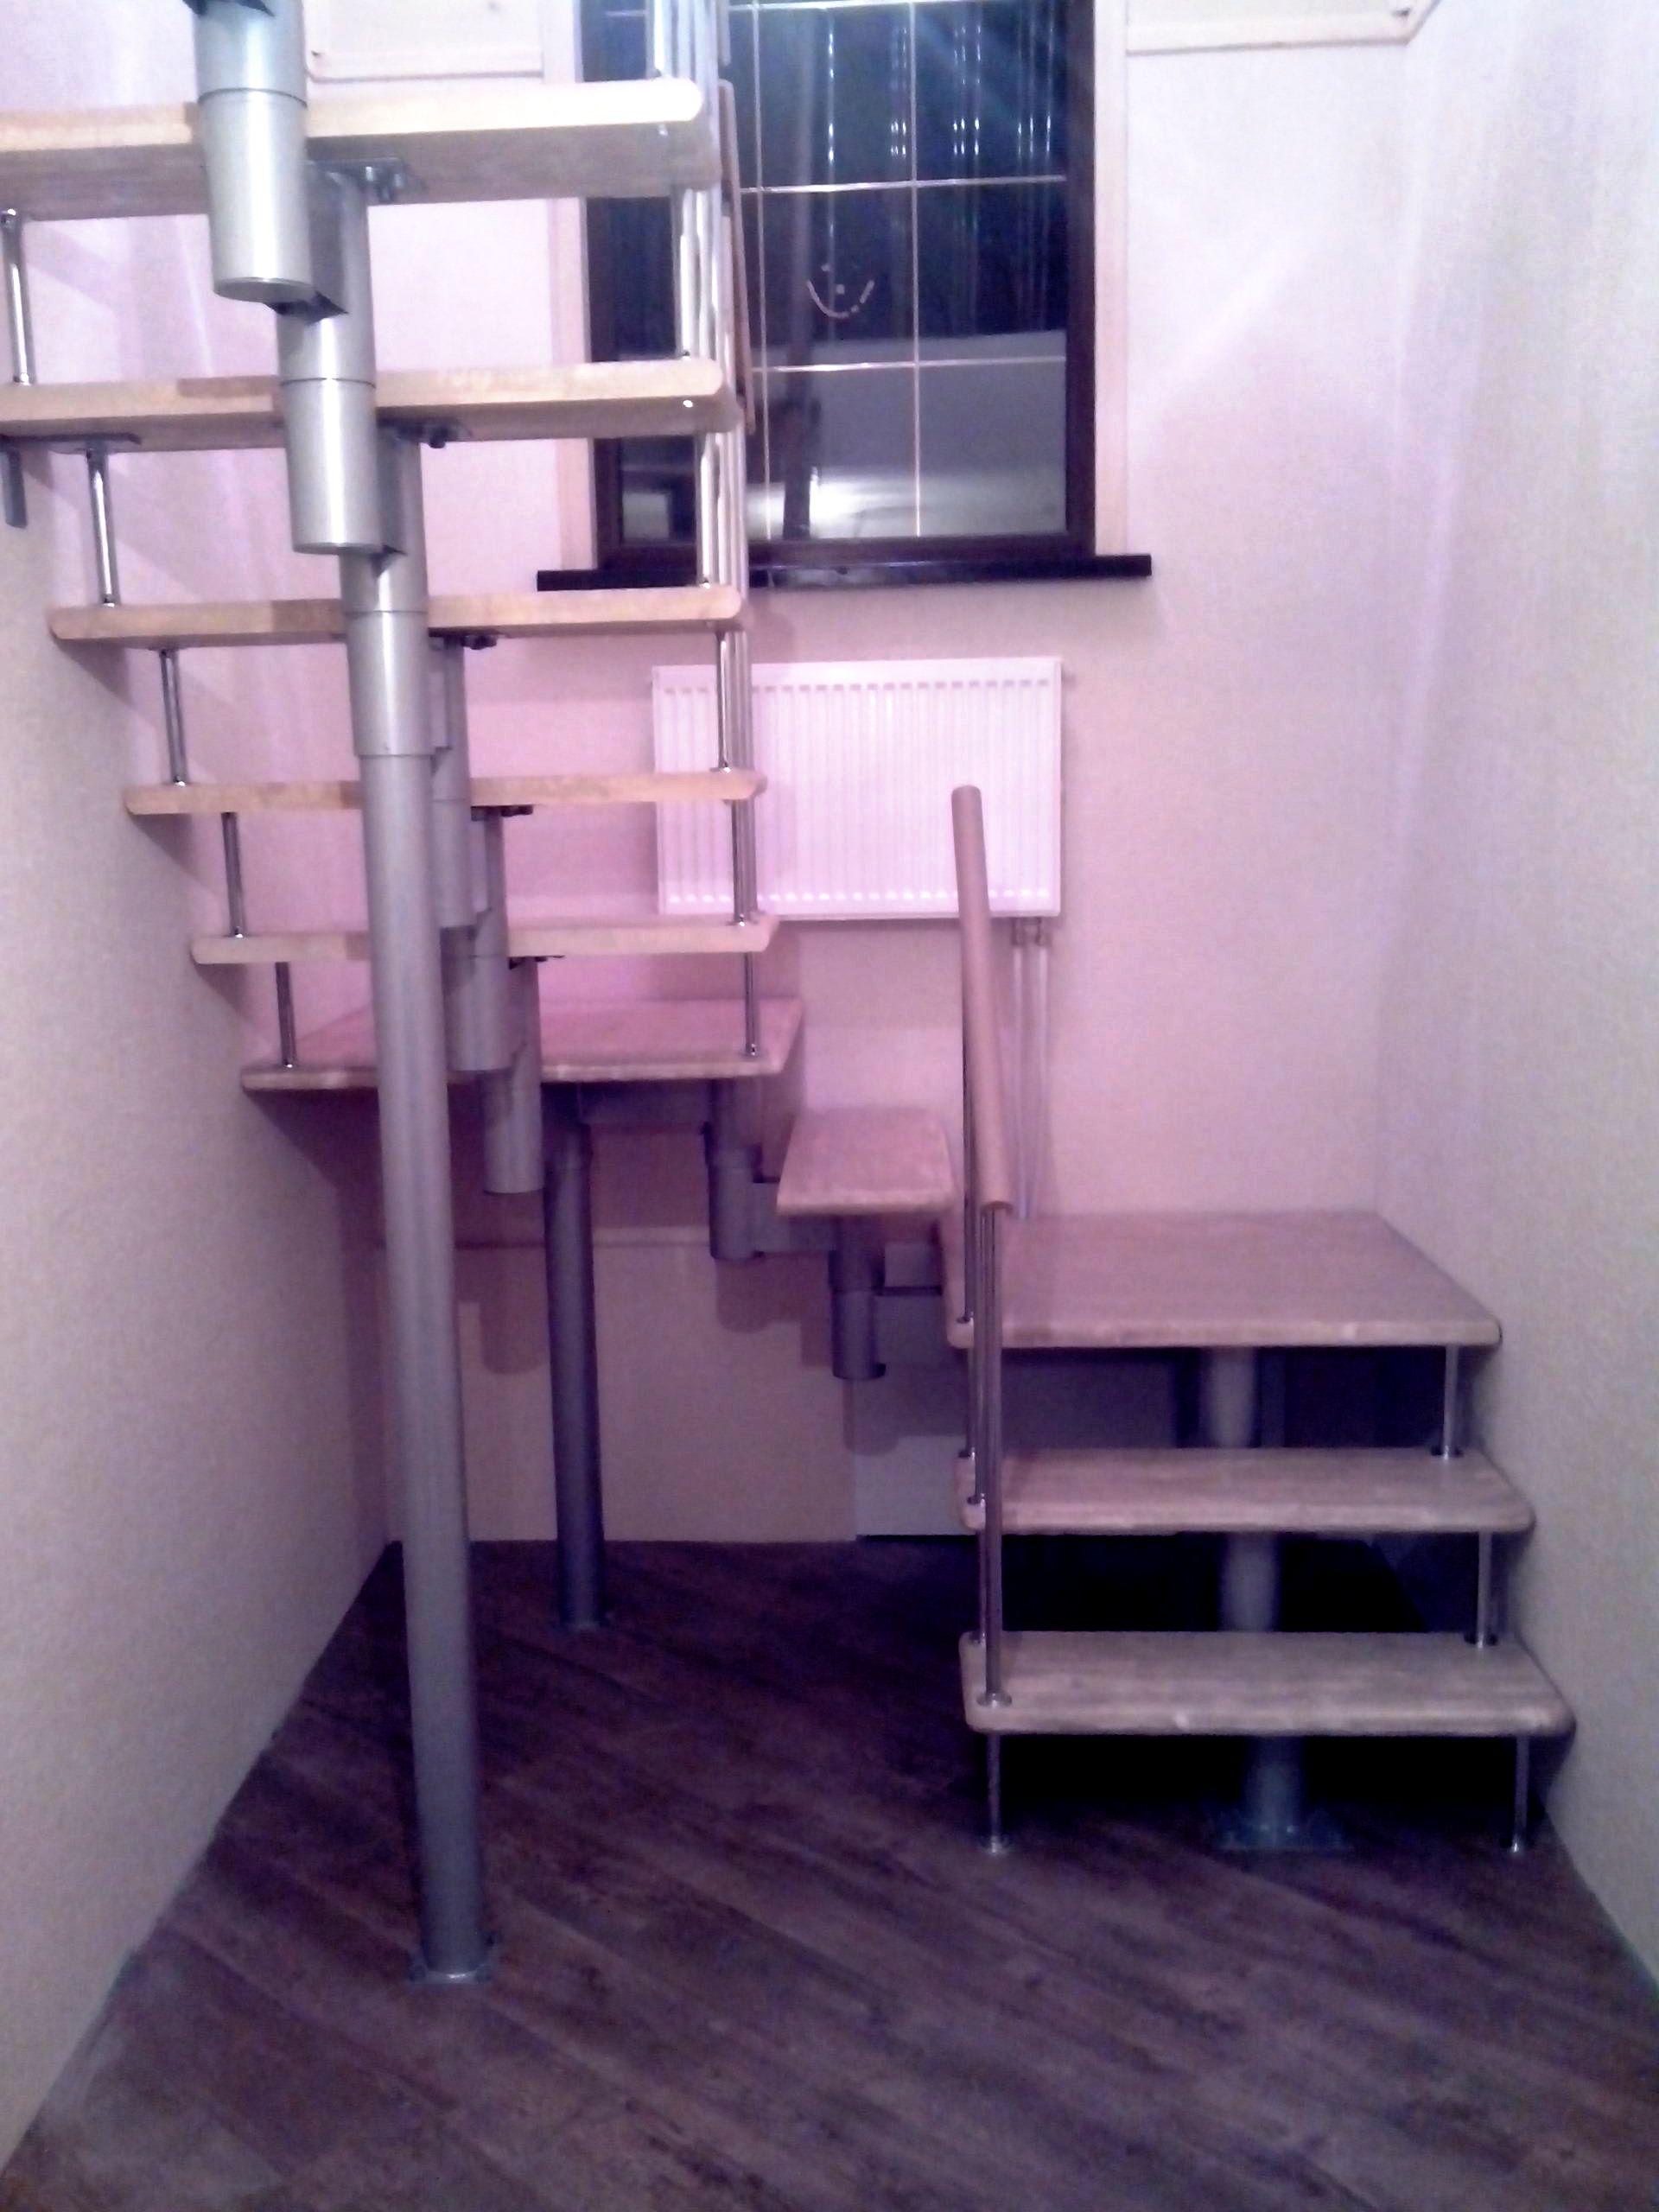 Комплектующие лестниц: поручни, перила, балясина